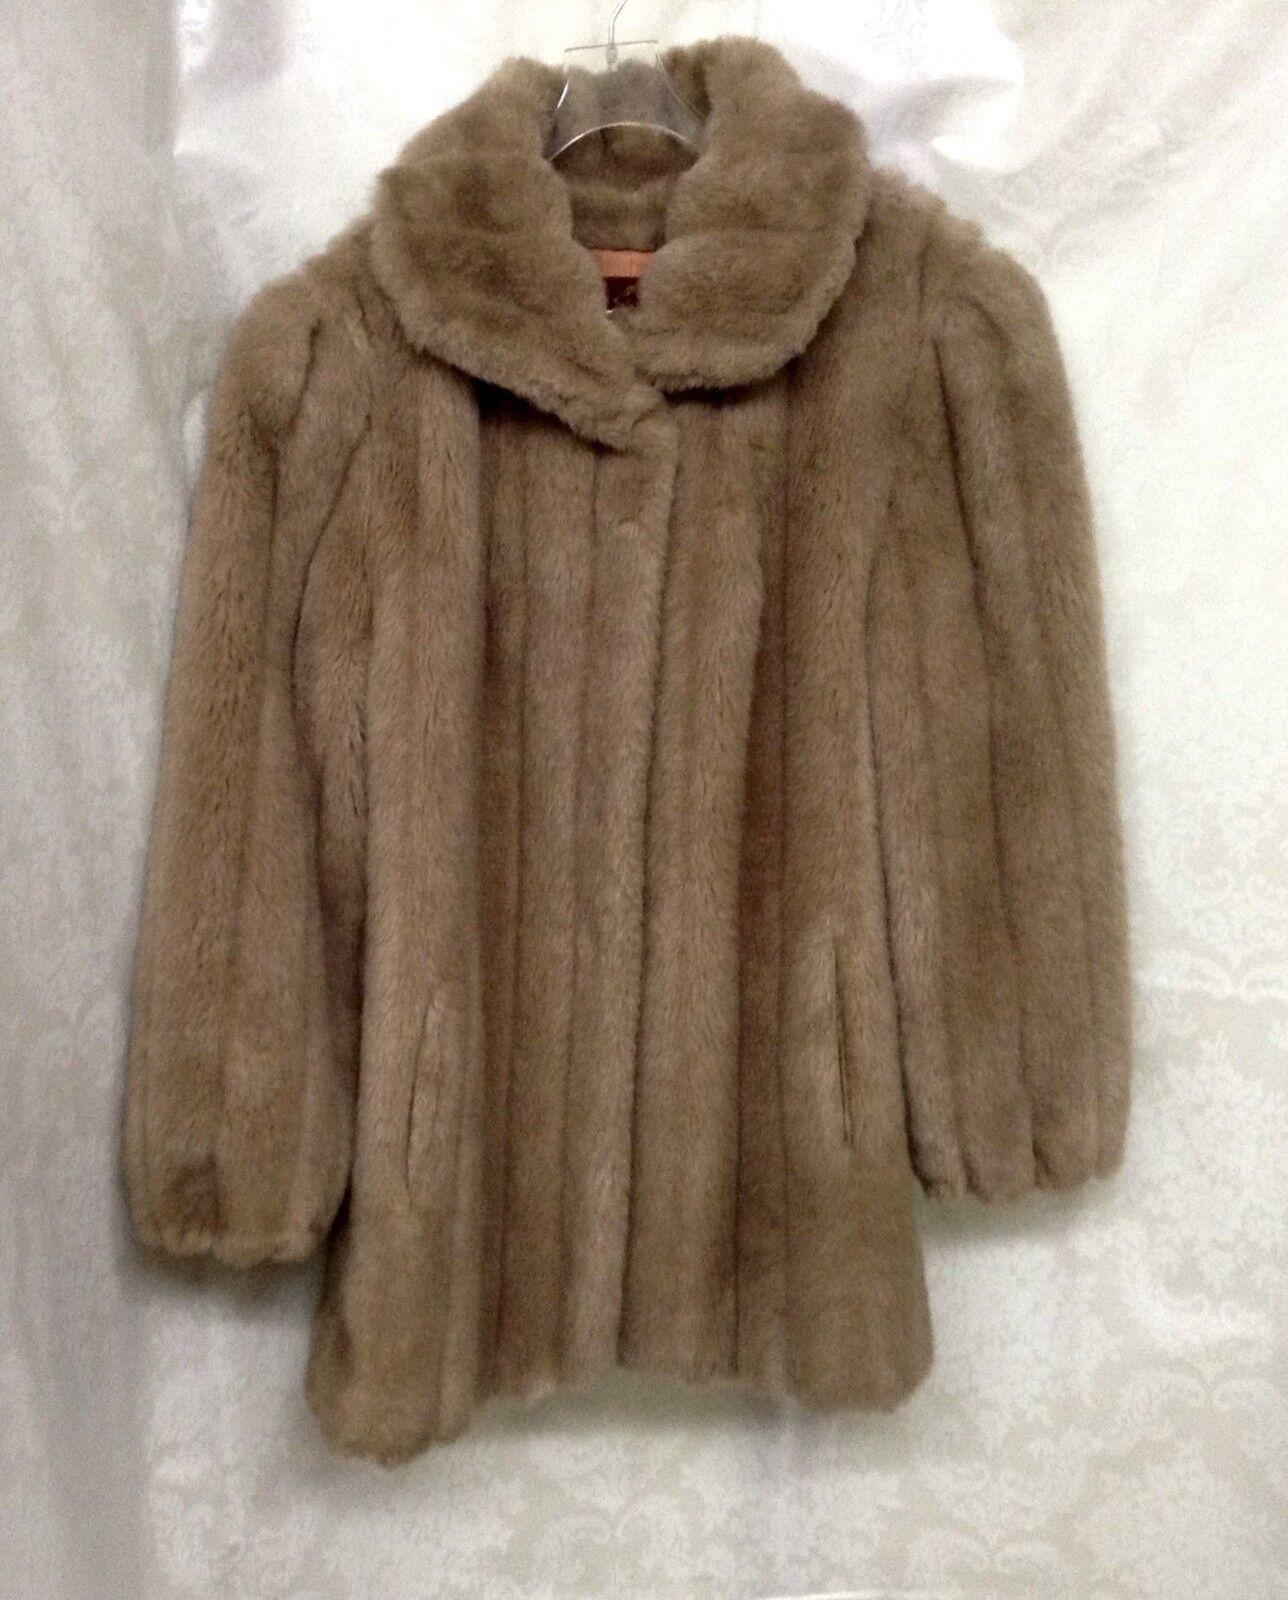 Jordache Womens Blond Faux Fur Coat